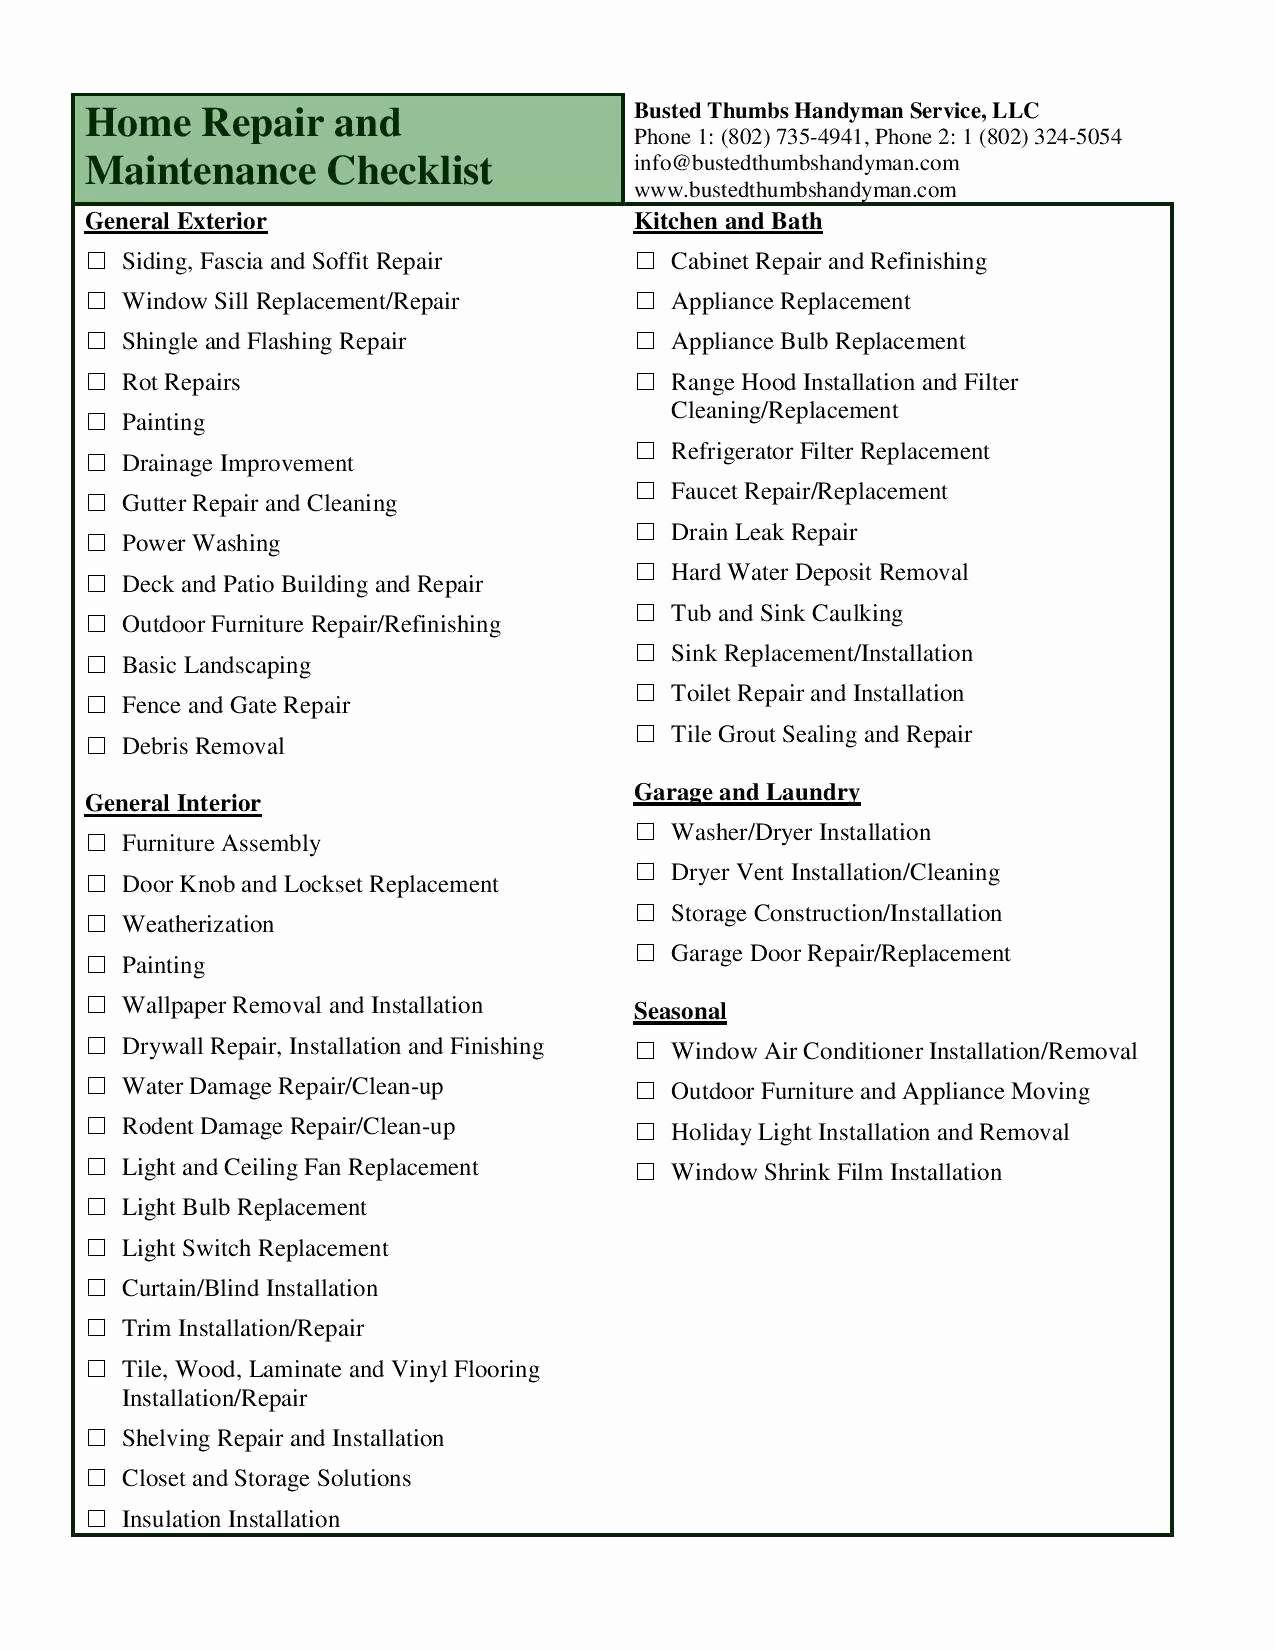 Contract Management Checklist Template Unique Checklist Dileep Decors Condo Kitchen Remodel Kitchen Remodel Checklist White Kitchen Remodeling